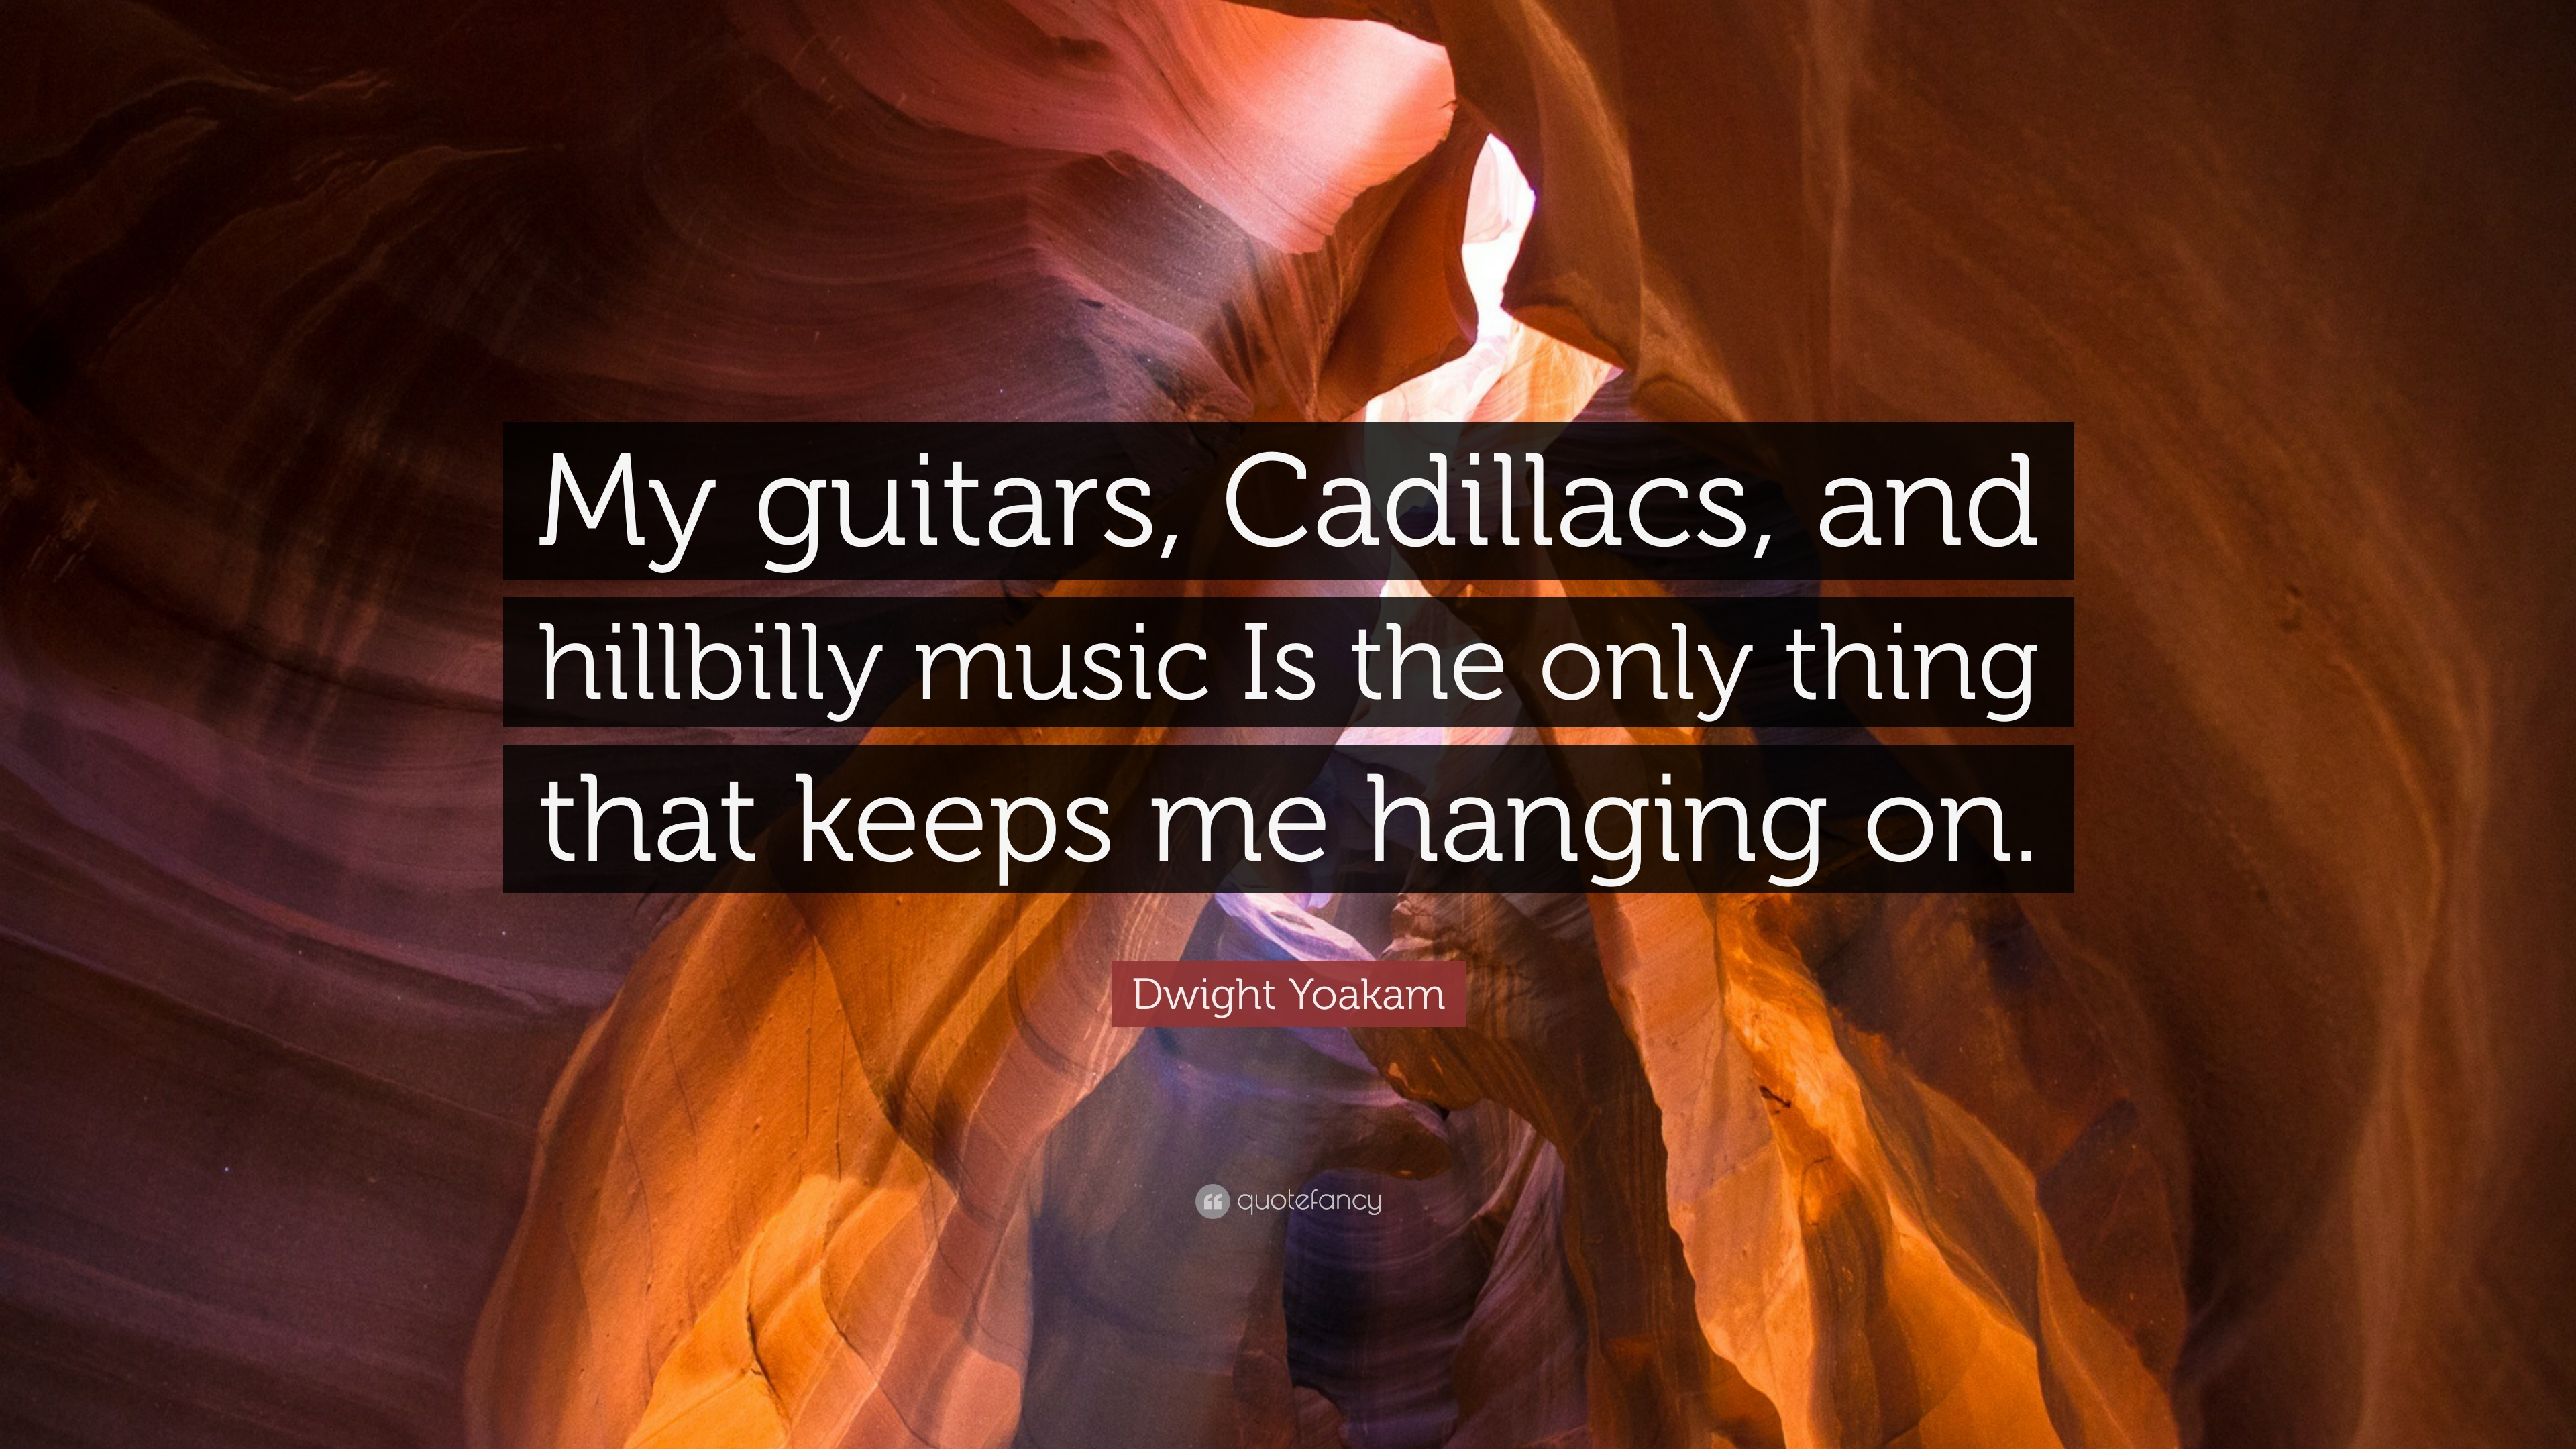 Guitars cadillacs and hillbilly music